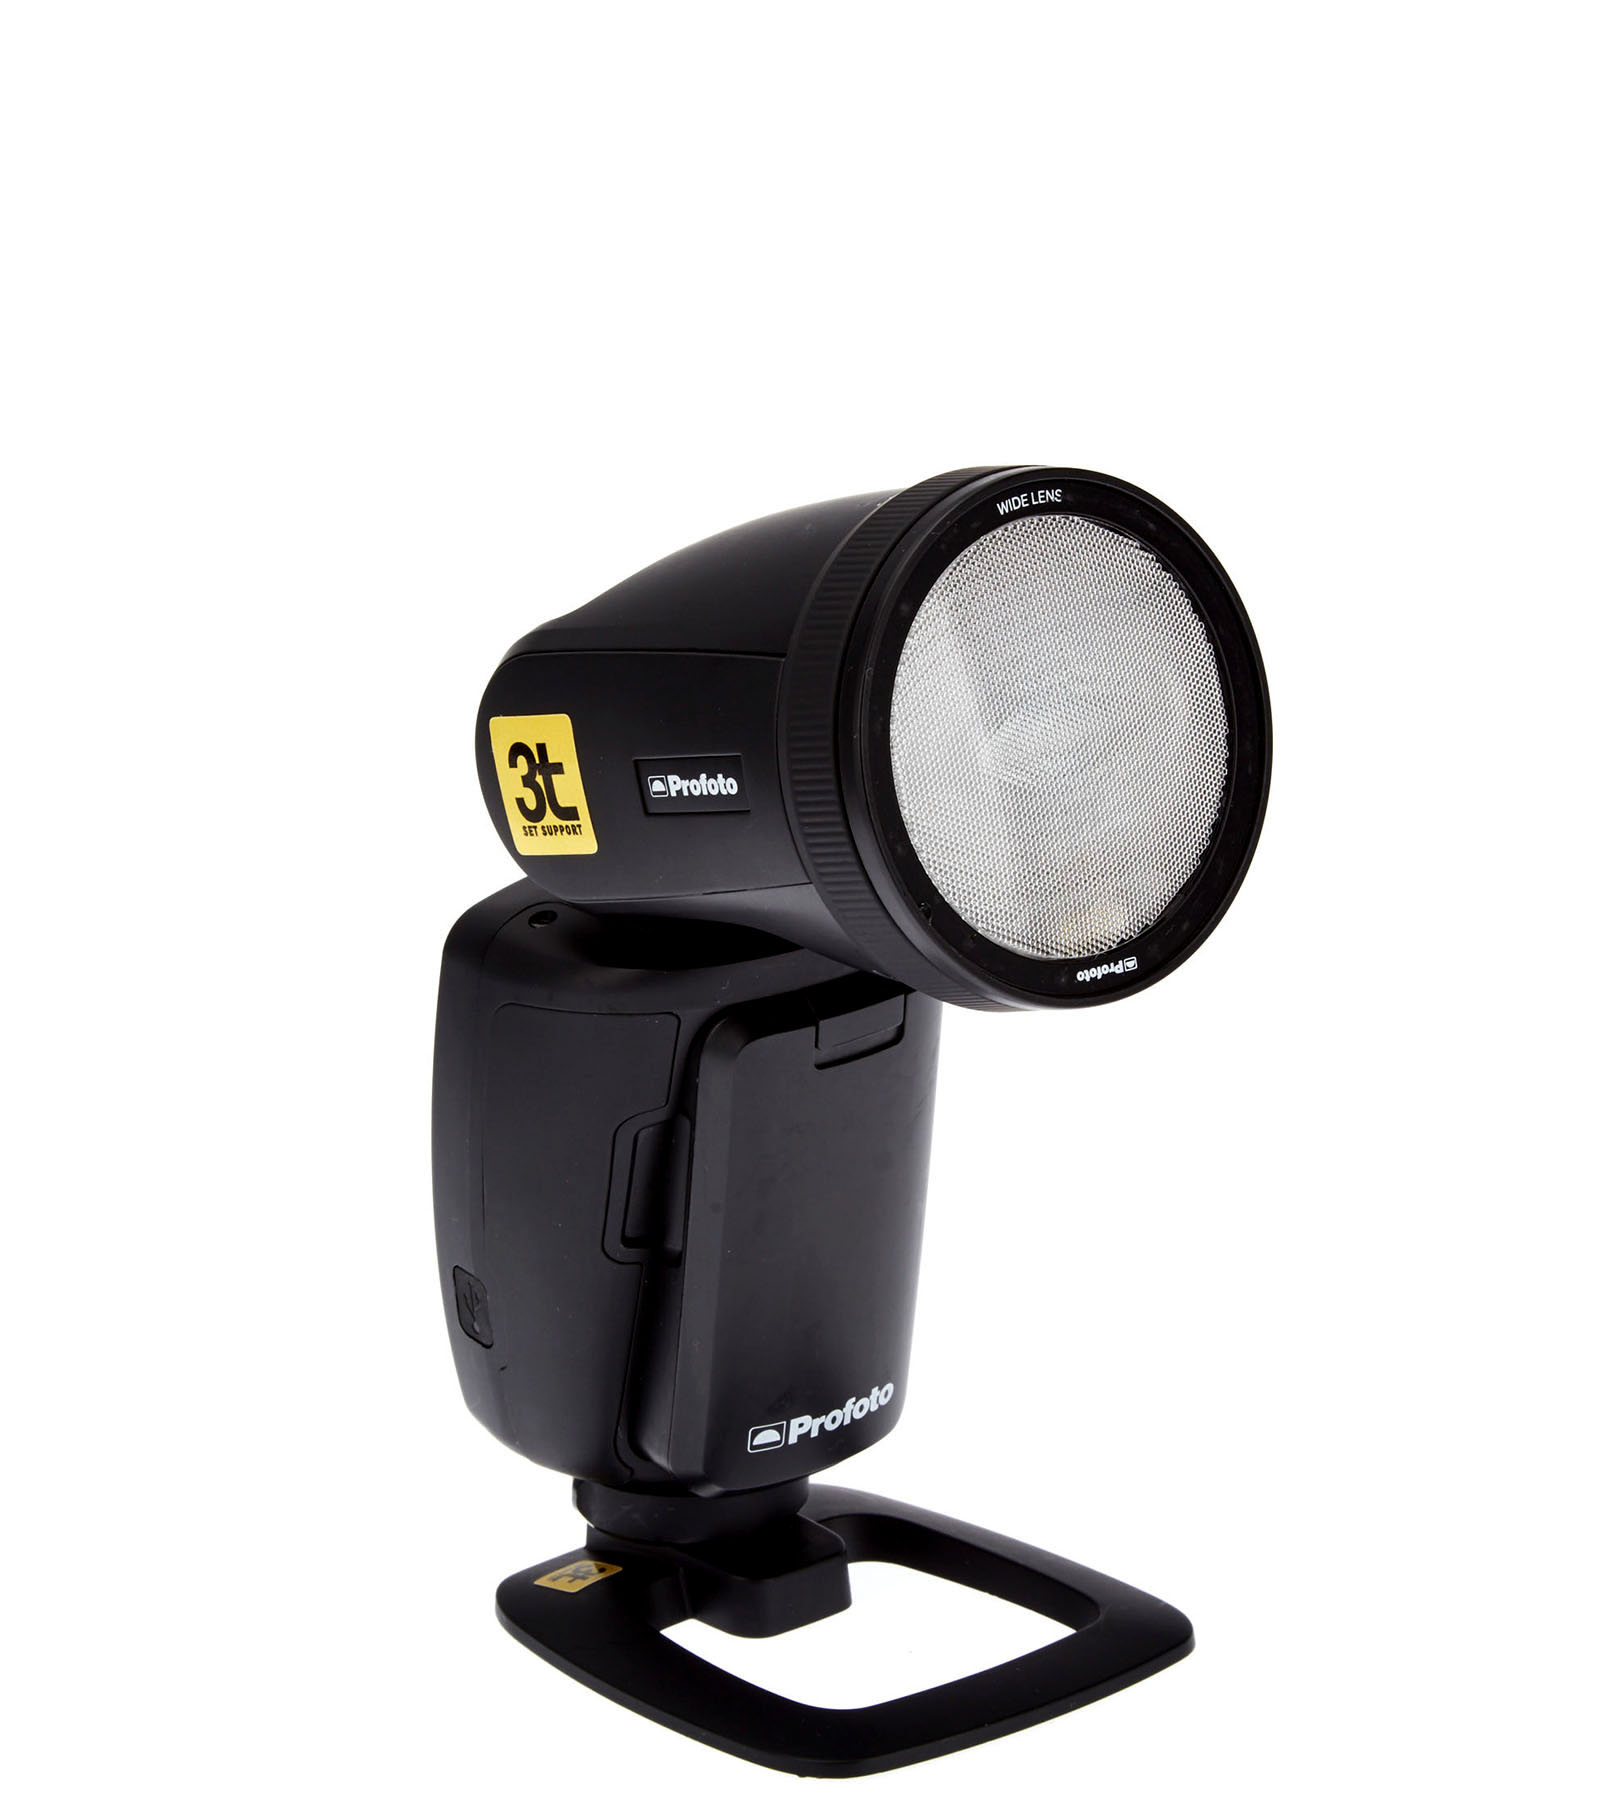 A1 AirTTL-C Studio Light Profoto para Canon (76W)